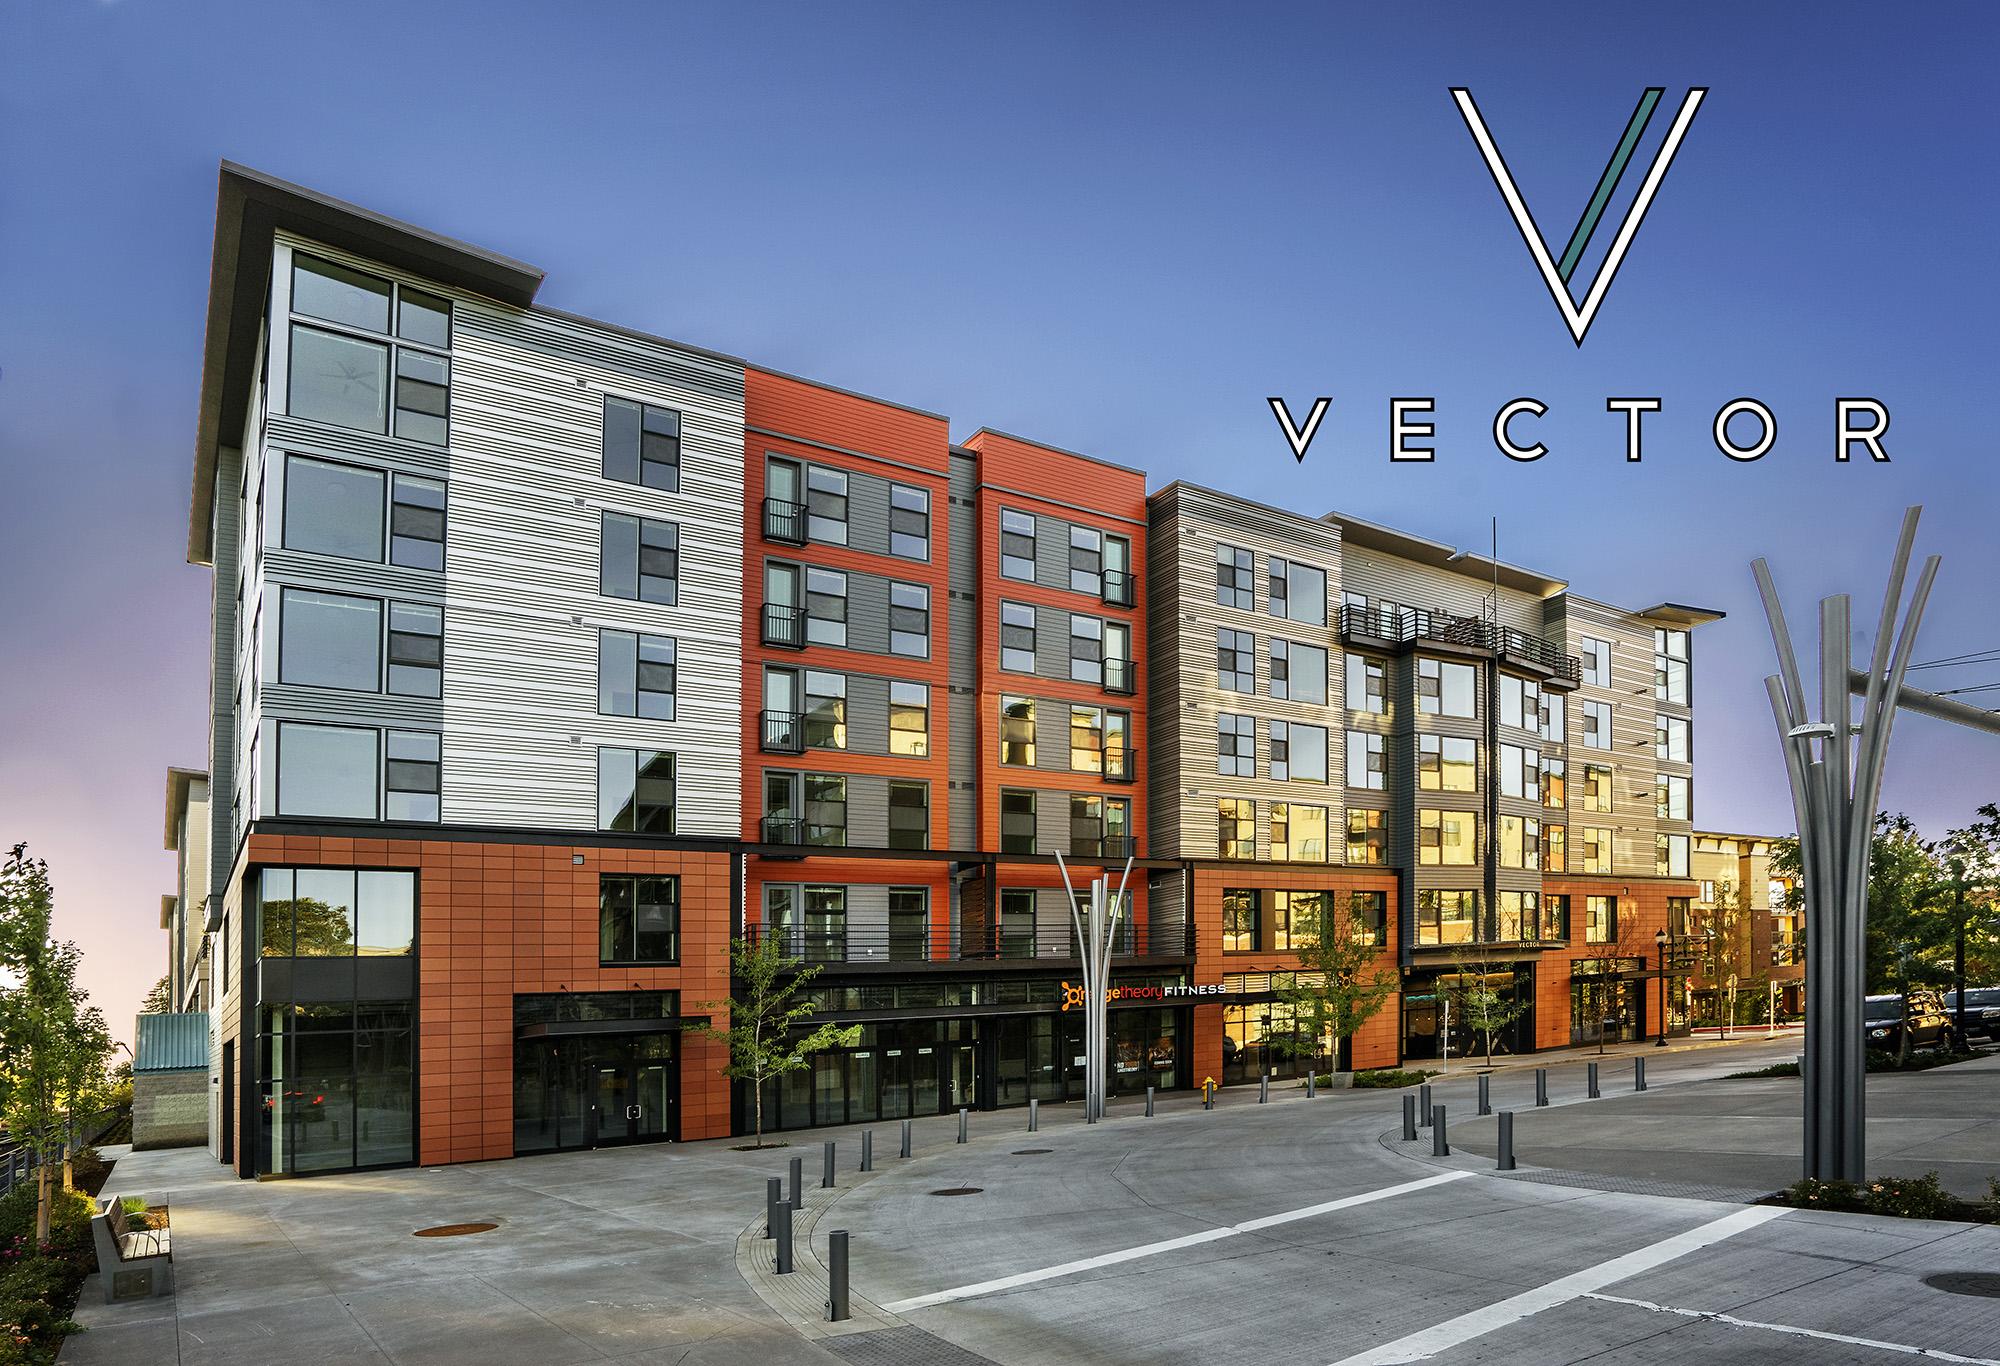 2000x1366 Vector Apartments, 967 Ne Orenco Station Loop, Hillsboro, Or